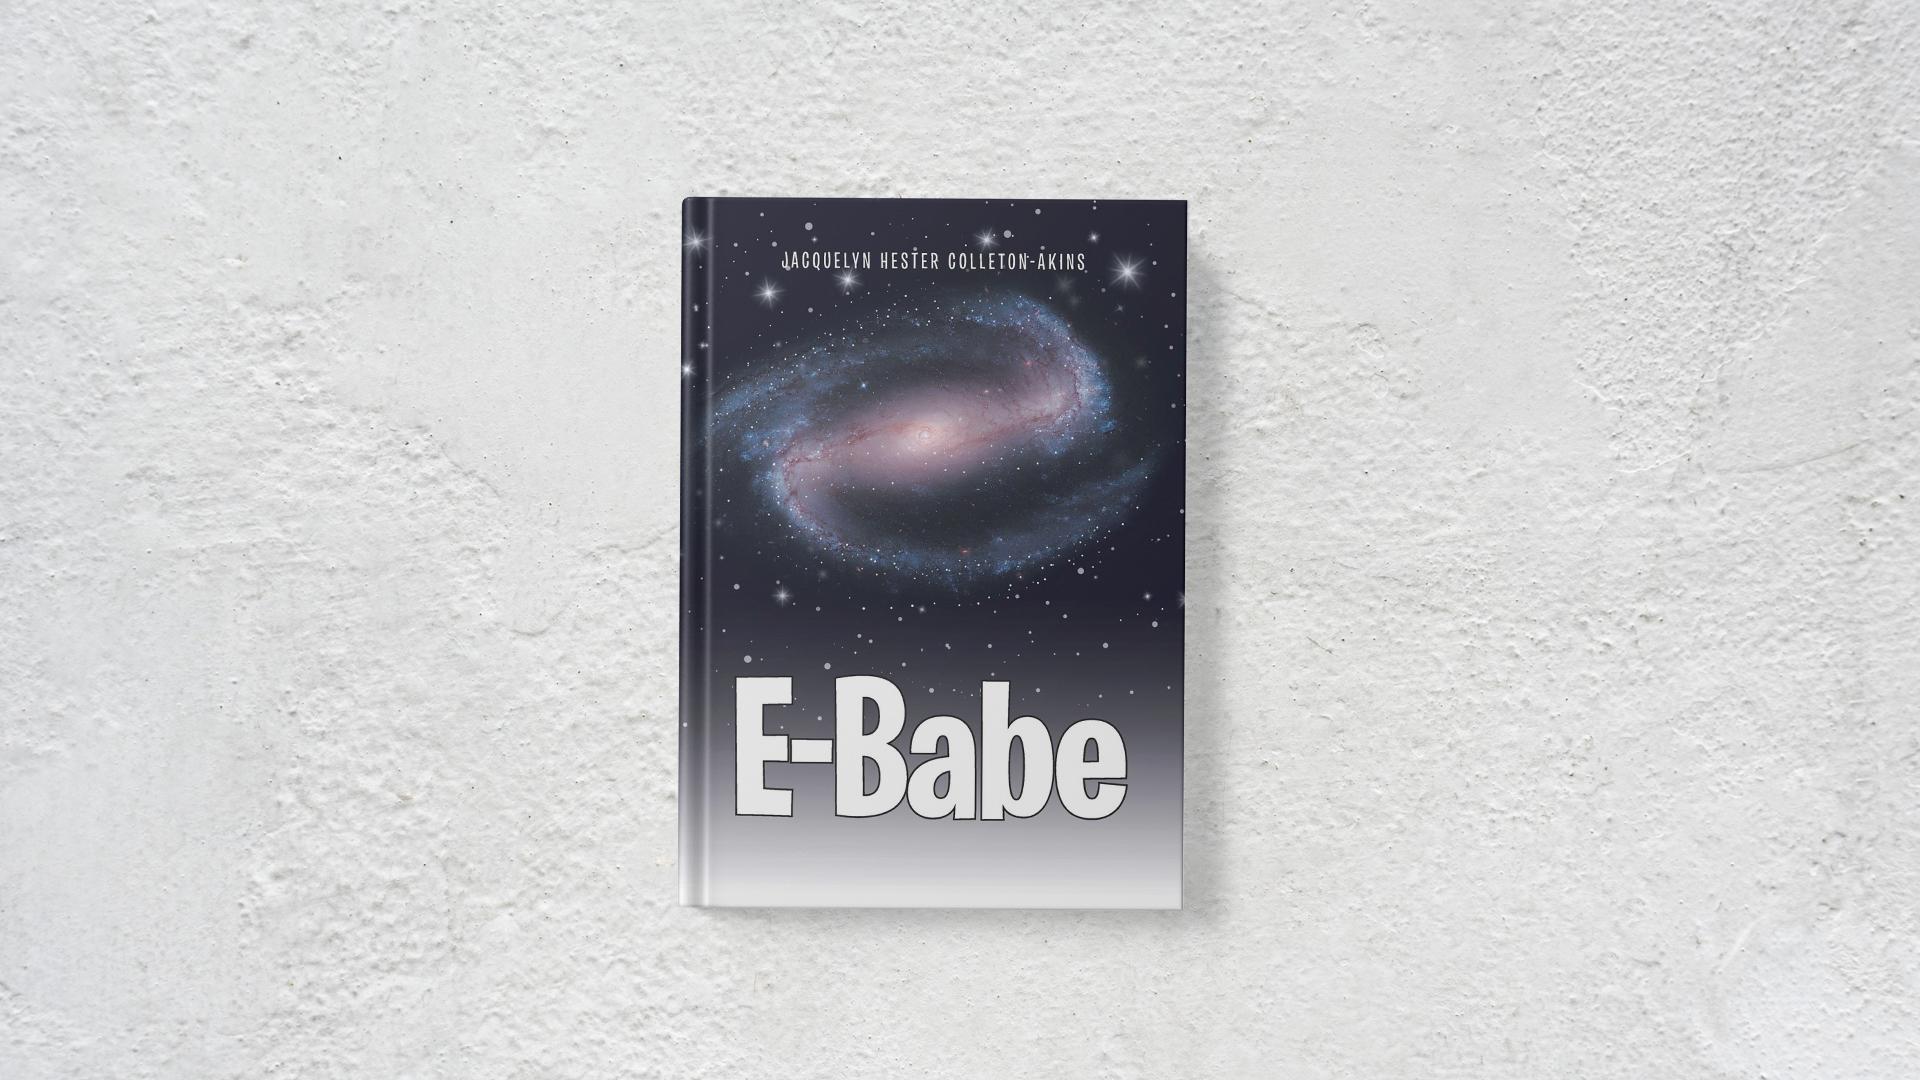 E-Babe by Jacquelyn Hester Colleton-Akins